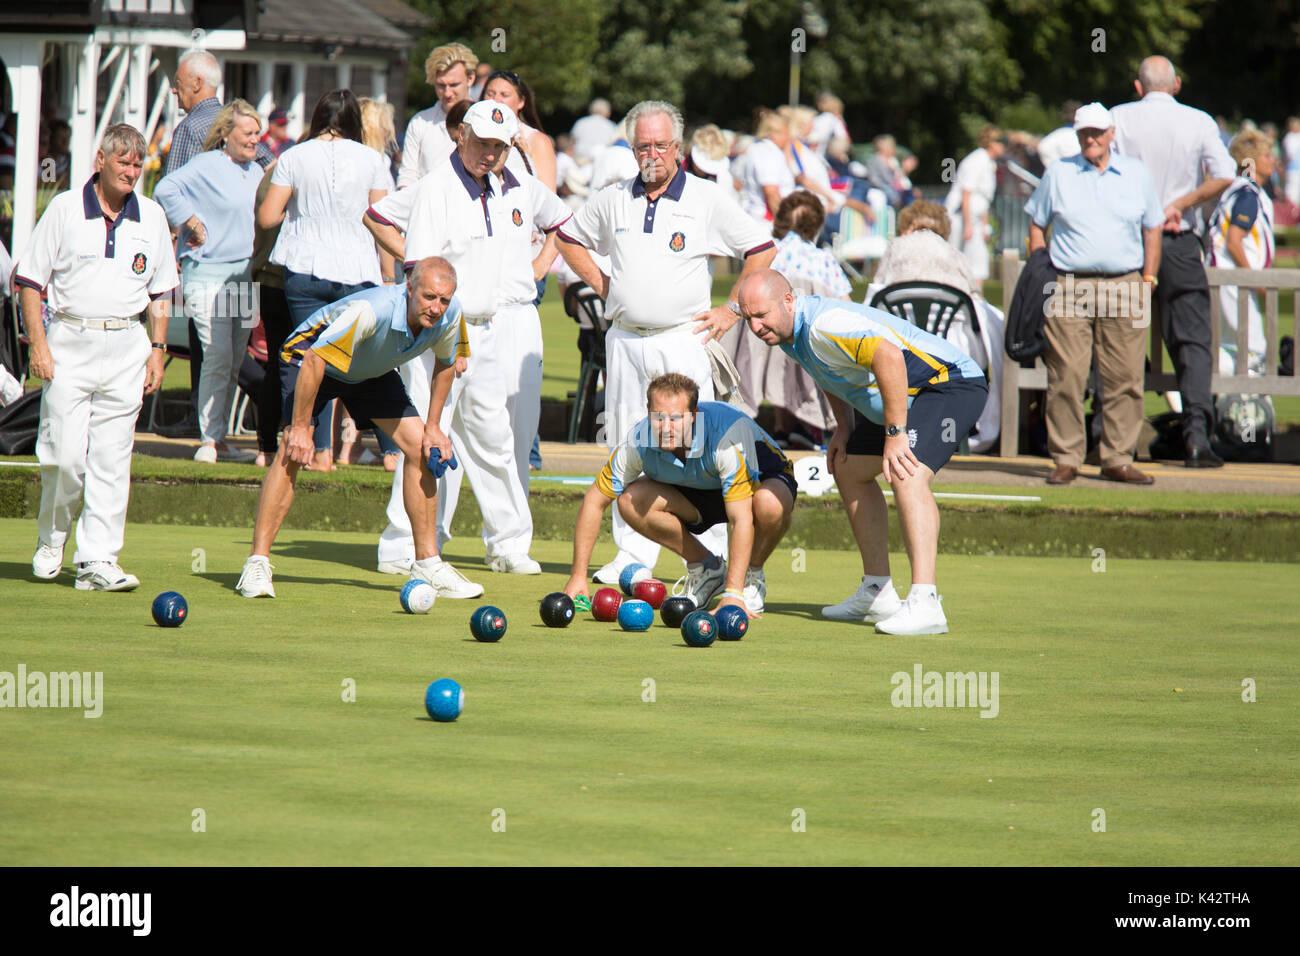 The National Bowls Finals, Victoria Park, Leamington Spa, England - Stock Image